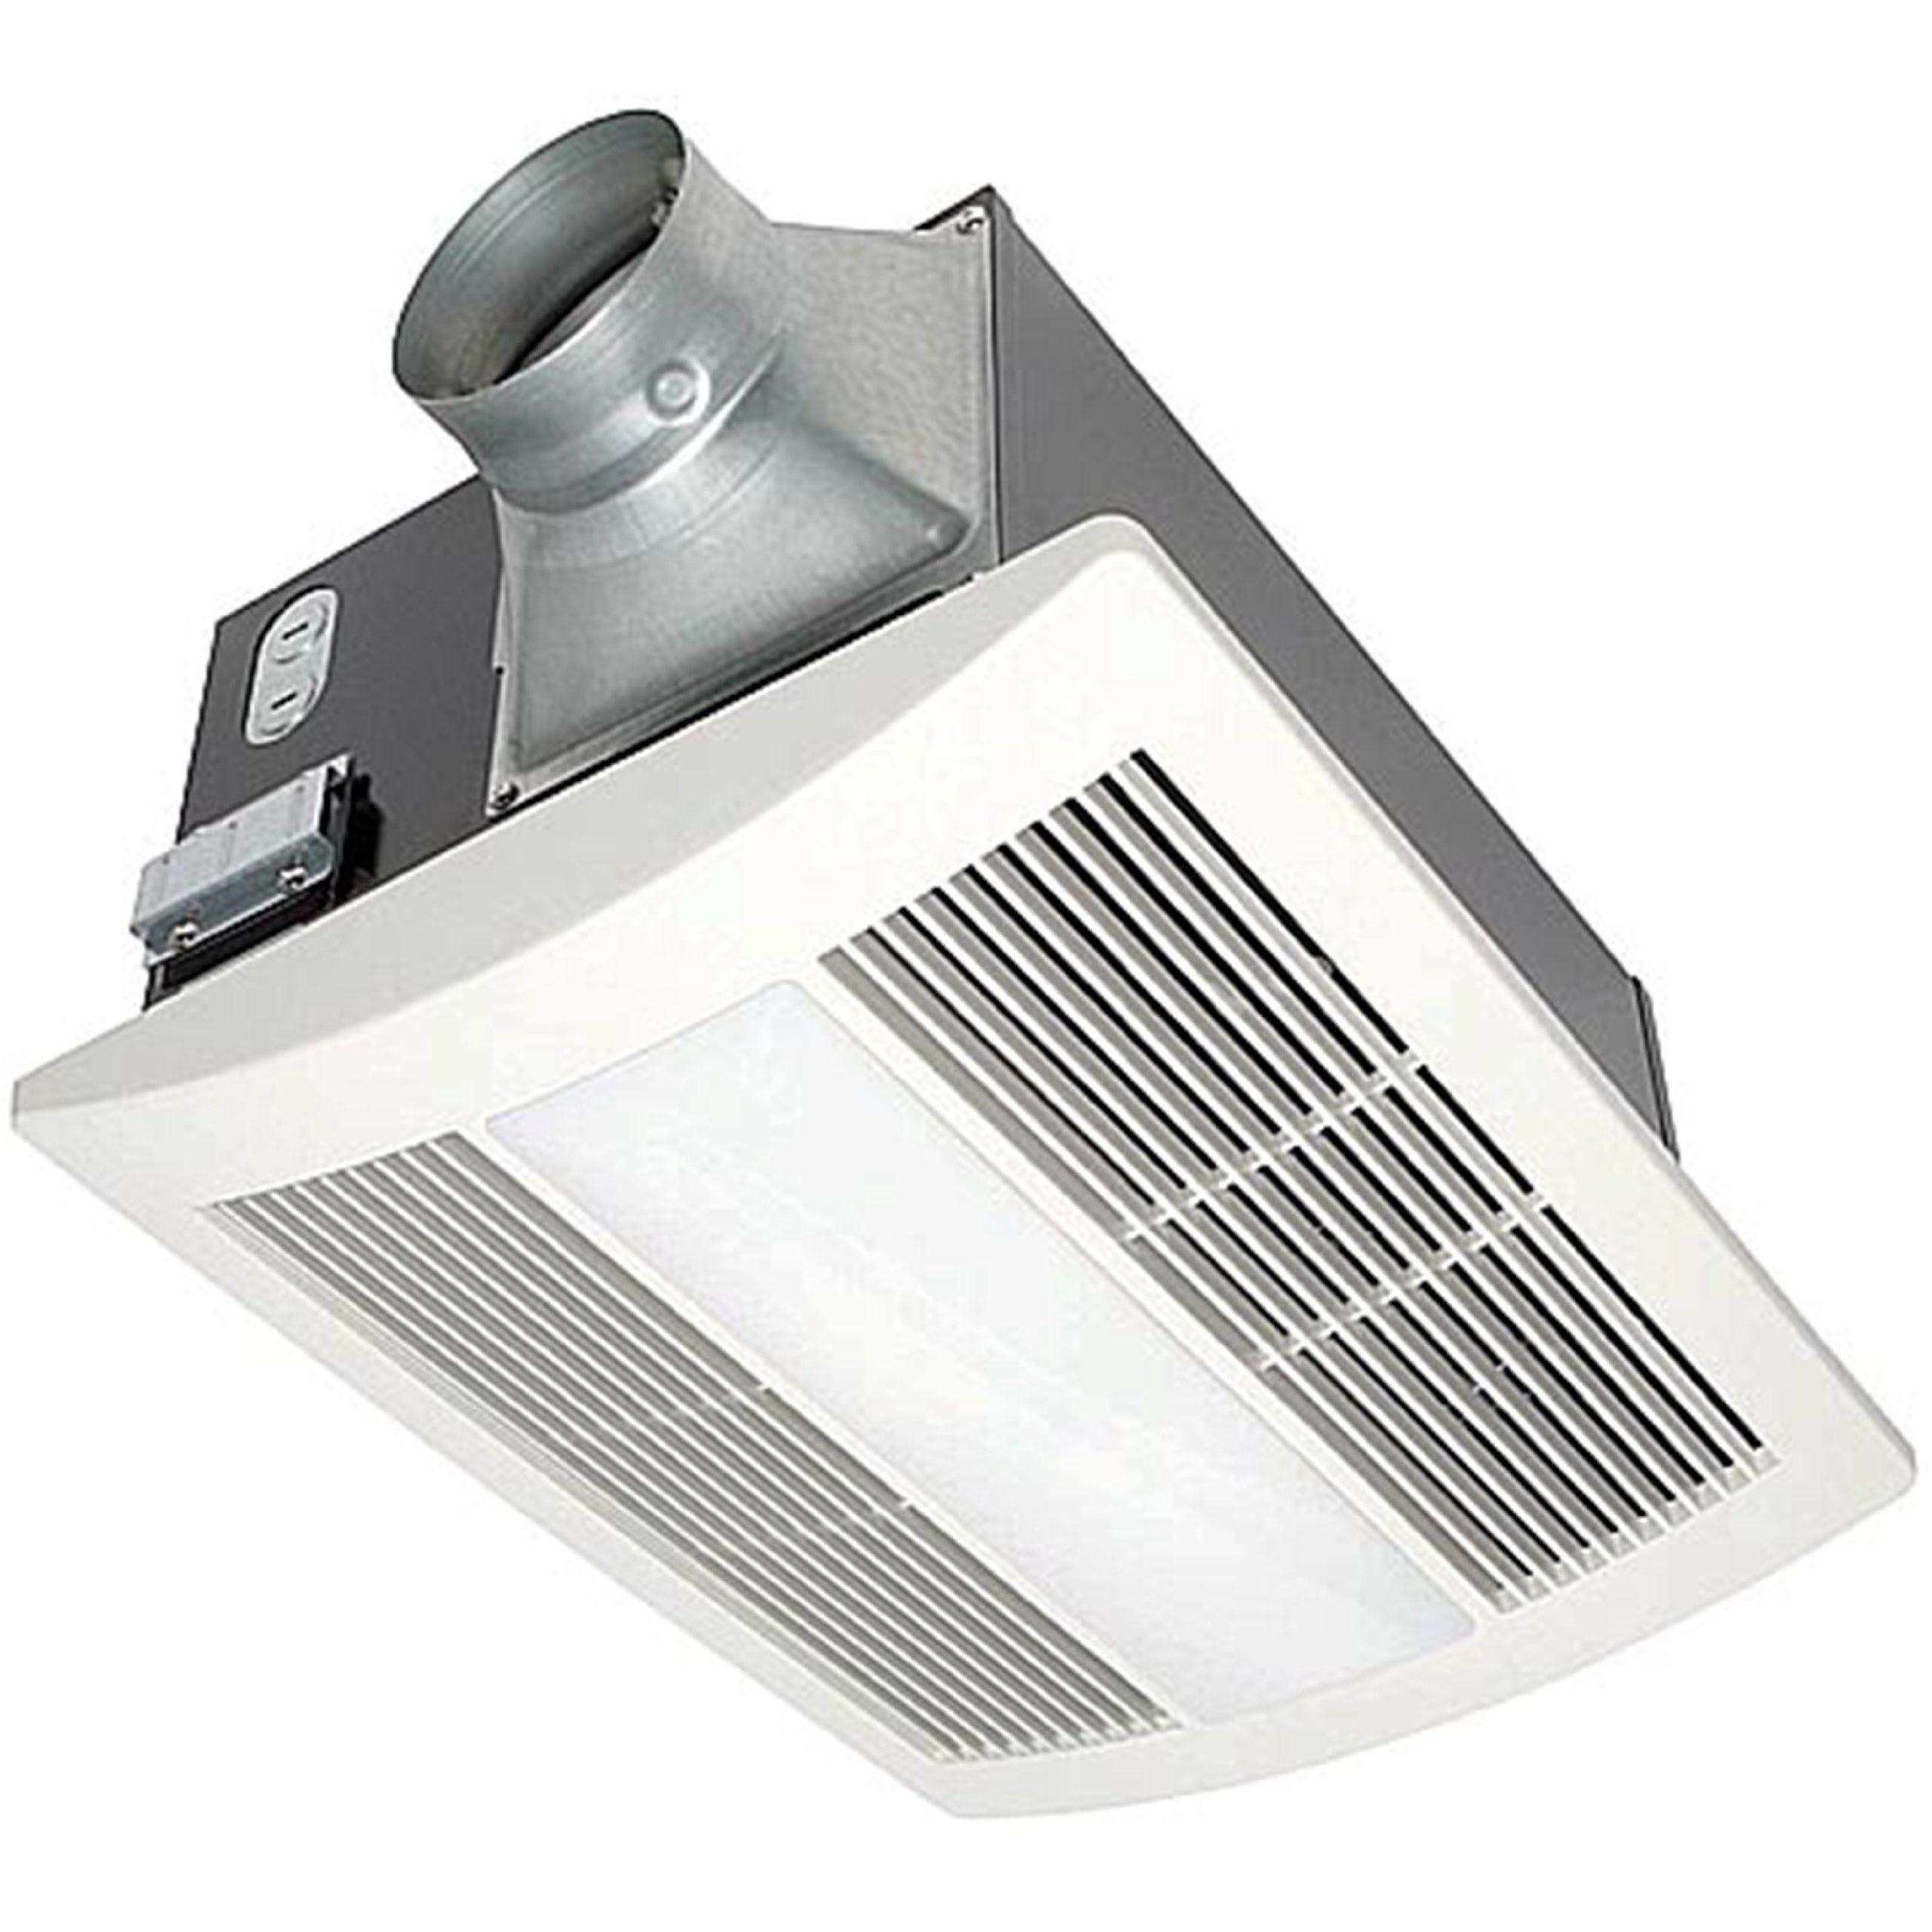 panasonic fv-11vhl2 whisperwarm 110 cfm ceiling mounted fan